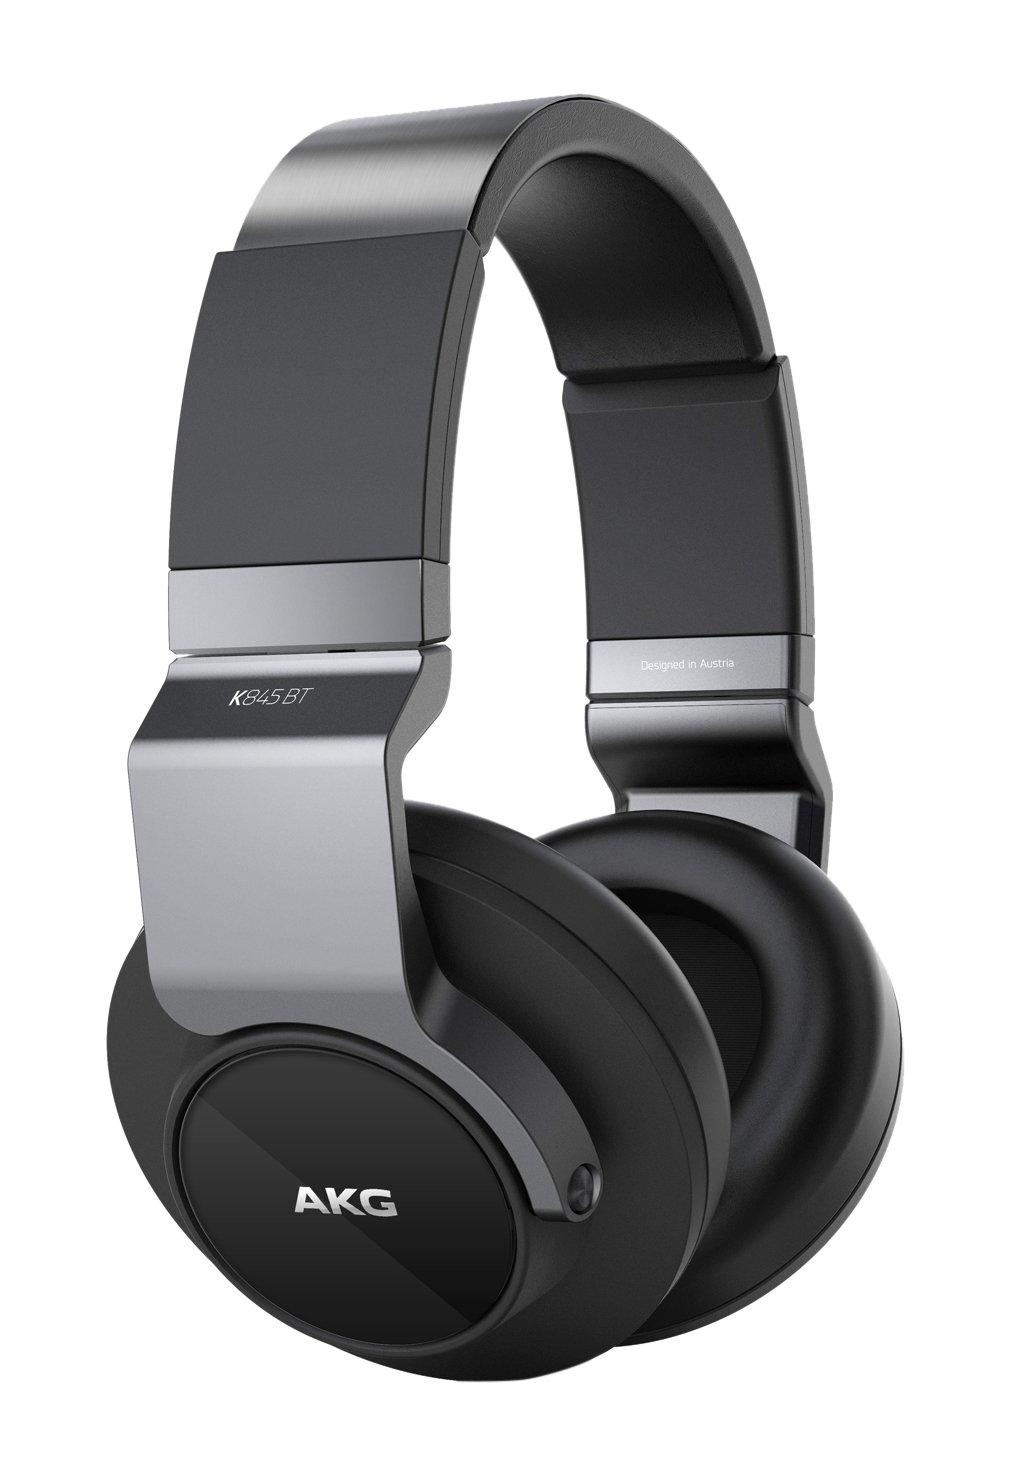 AKG K 845BT High Performance Wireless Bluetooth NFC Pairing Foldable Over-Ear Headphones £89.95